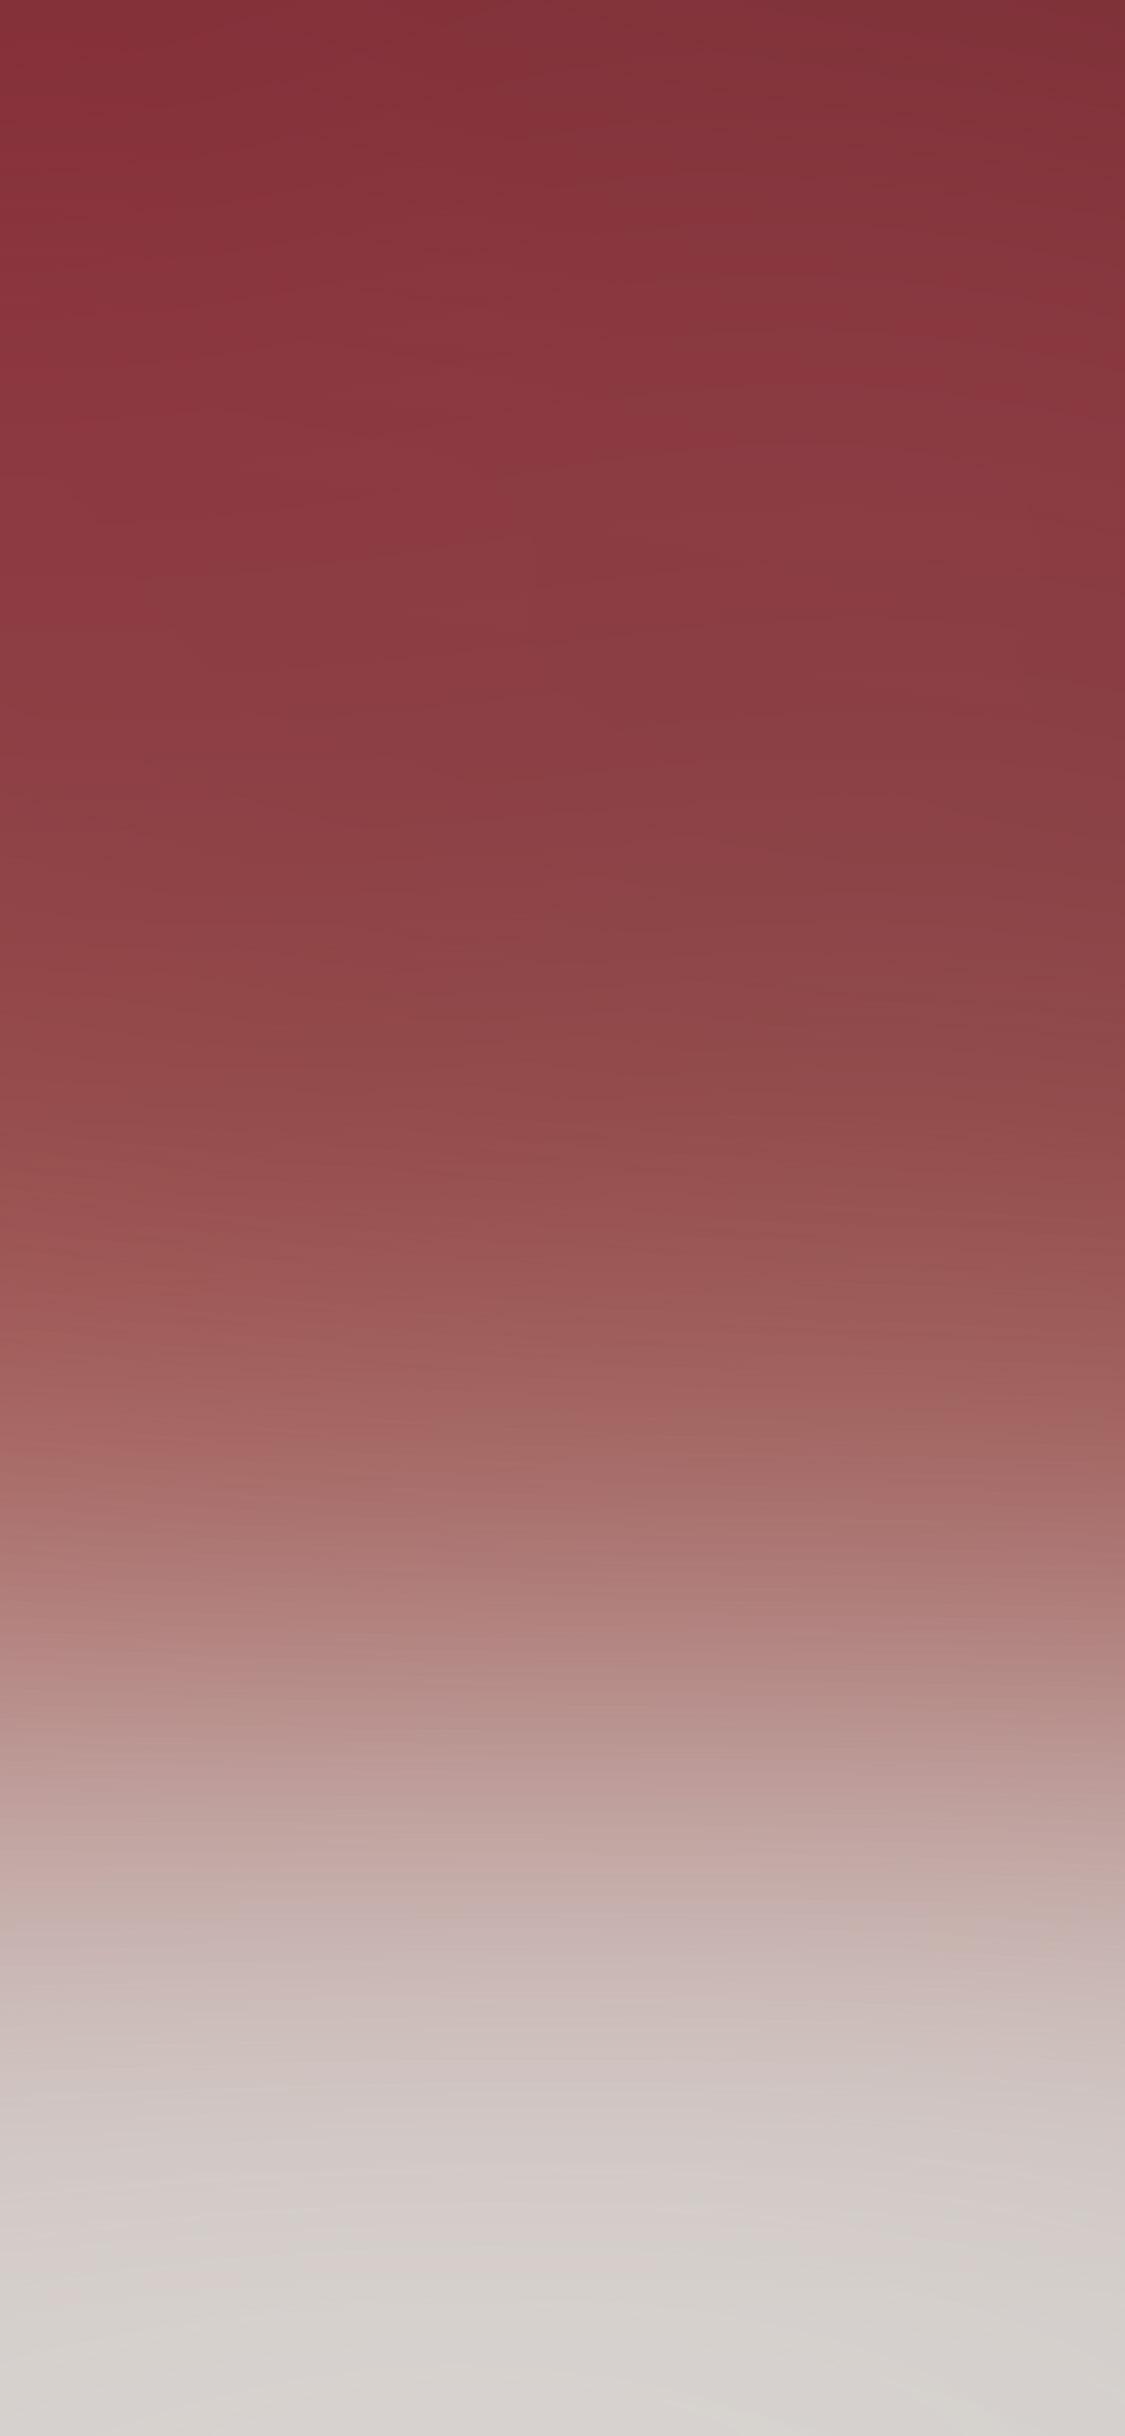 iPhonexpapers.com-Apple-iPhone-wallpaper-so28-blur-gradation-red-soft